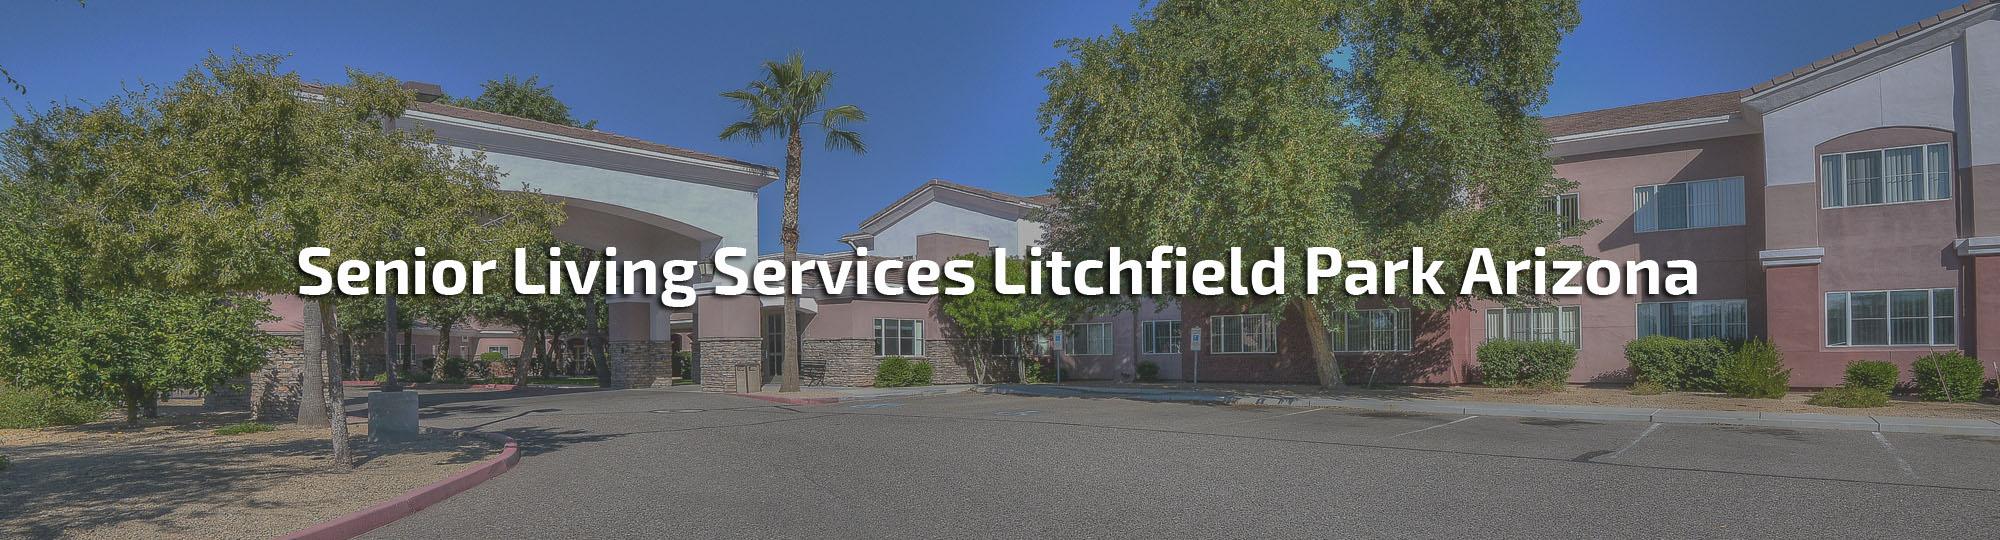 Senior Living Services Litchfield Park Arizona